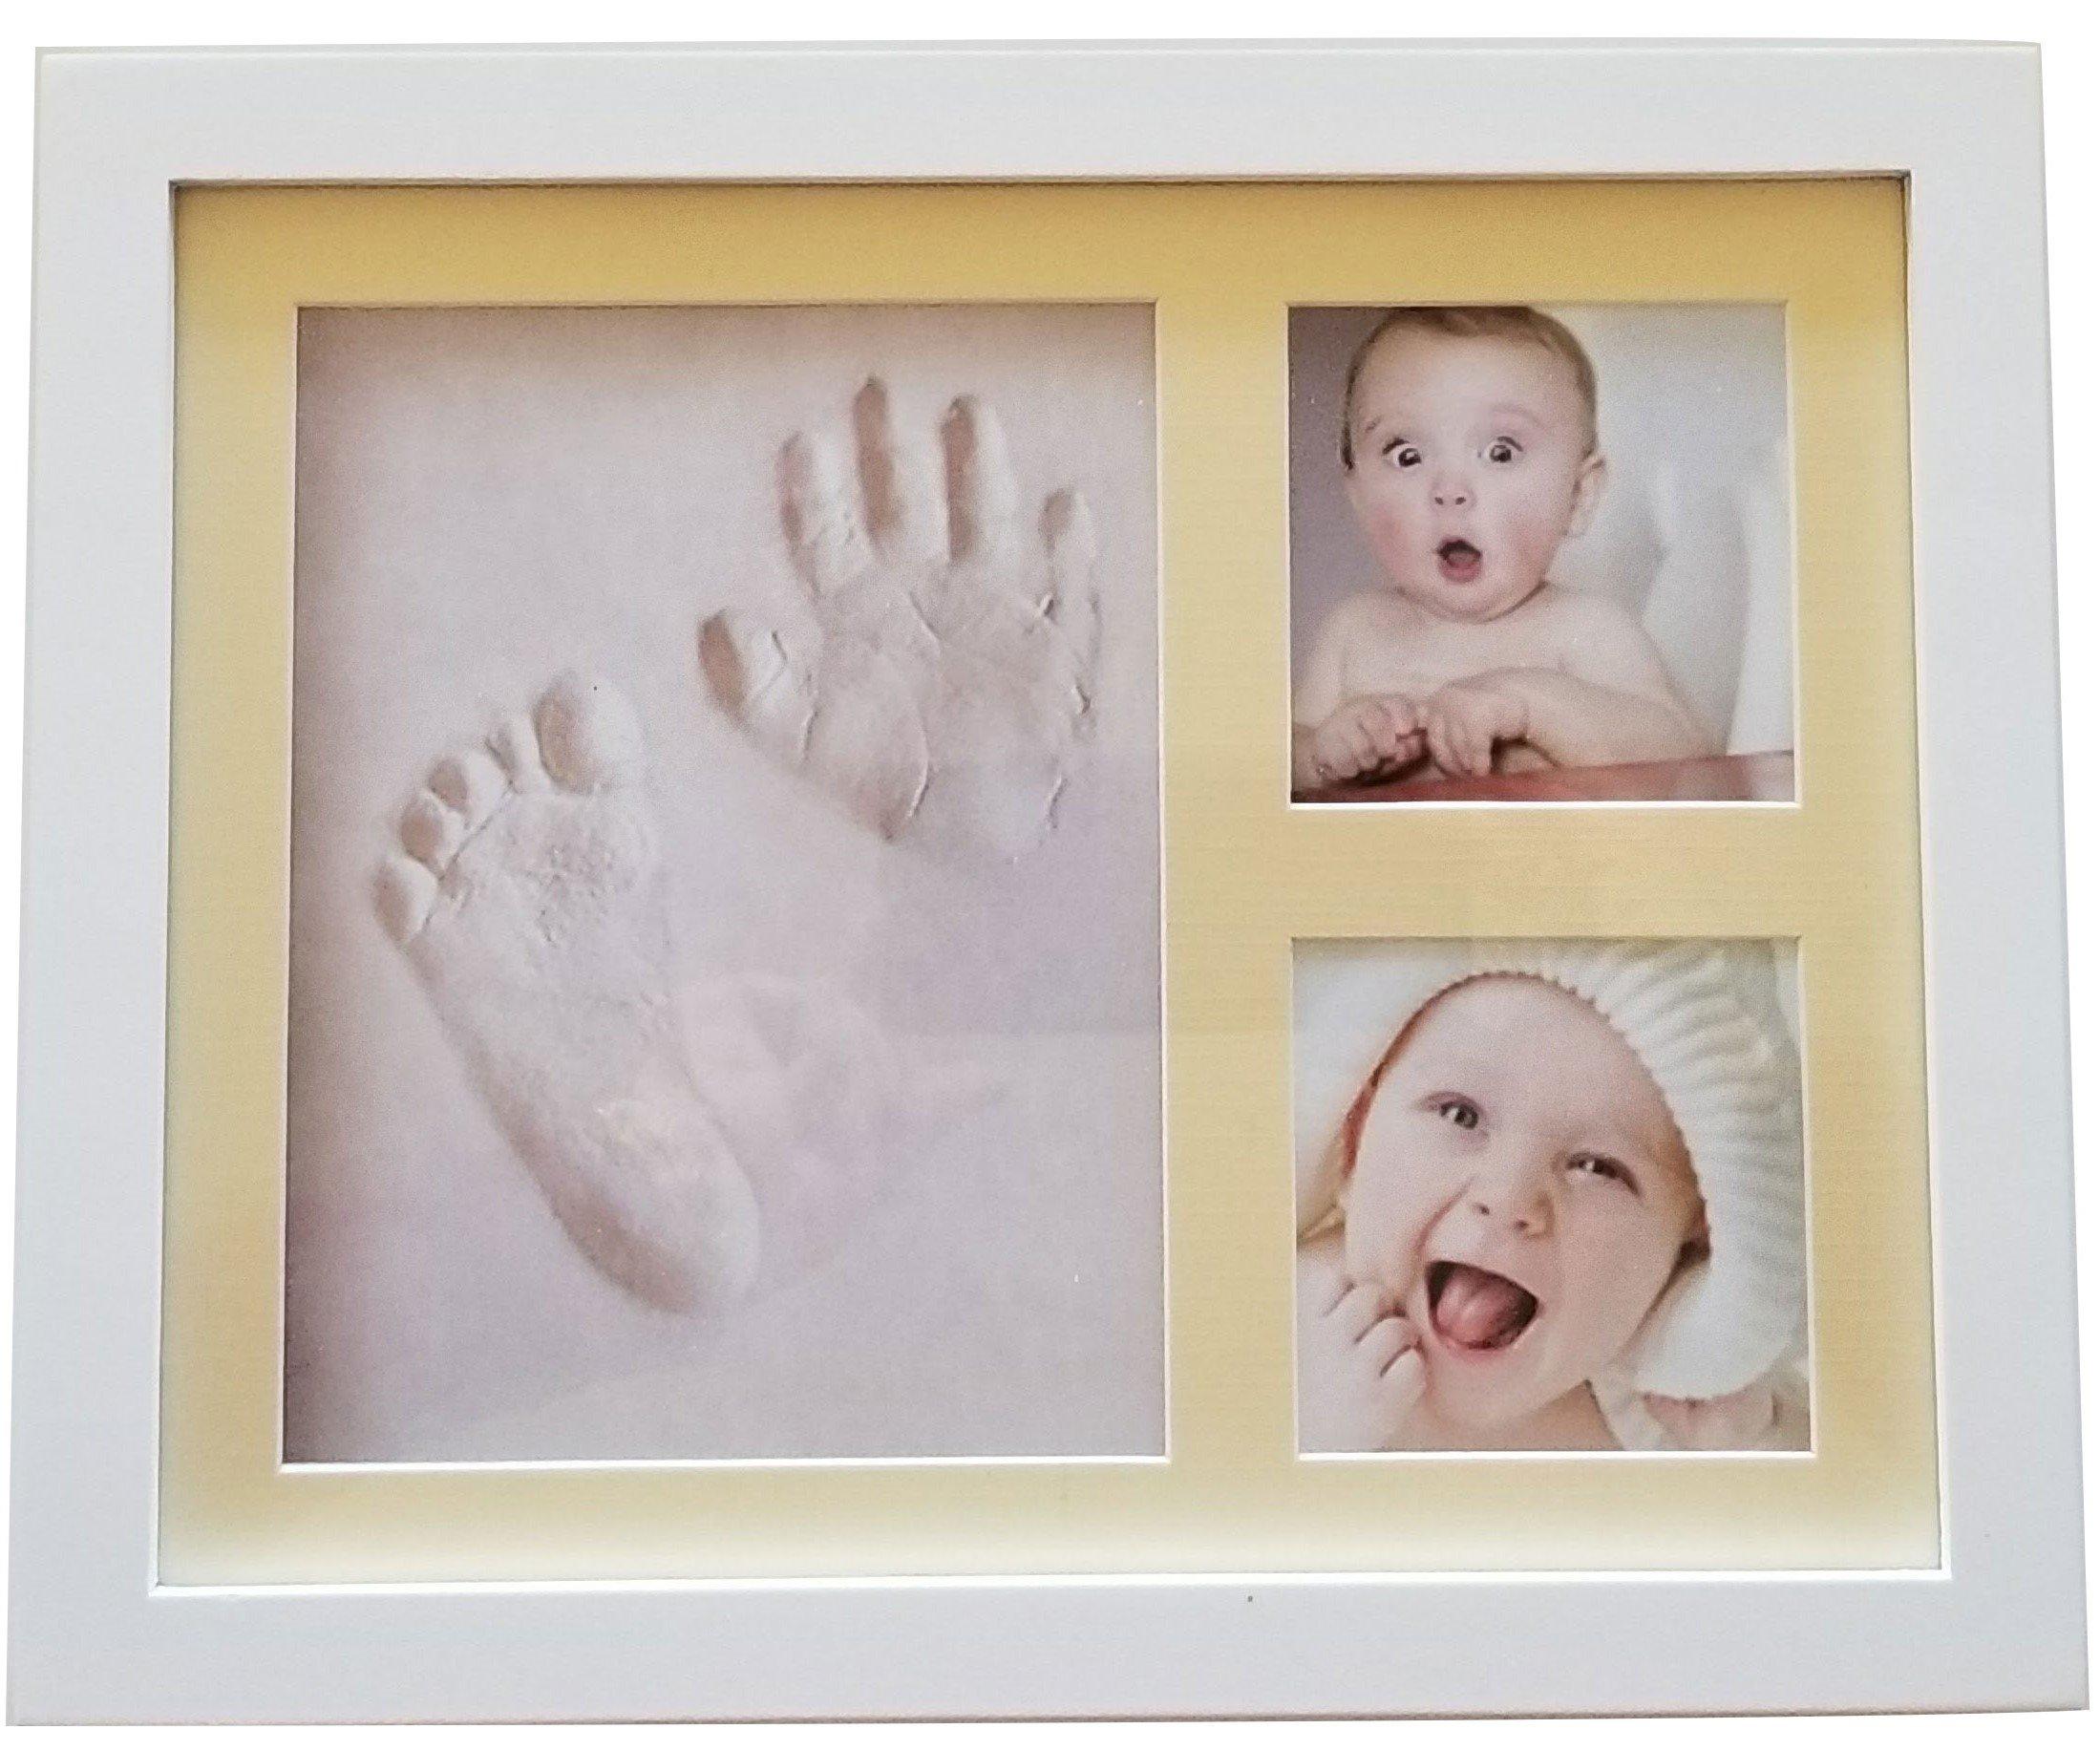 Namuri Pendant Baby Imprint Material With Real Diamond Baby Keepsake Gift